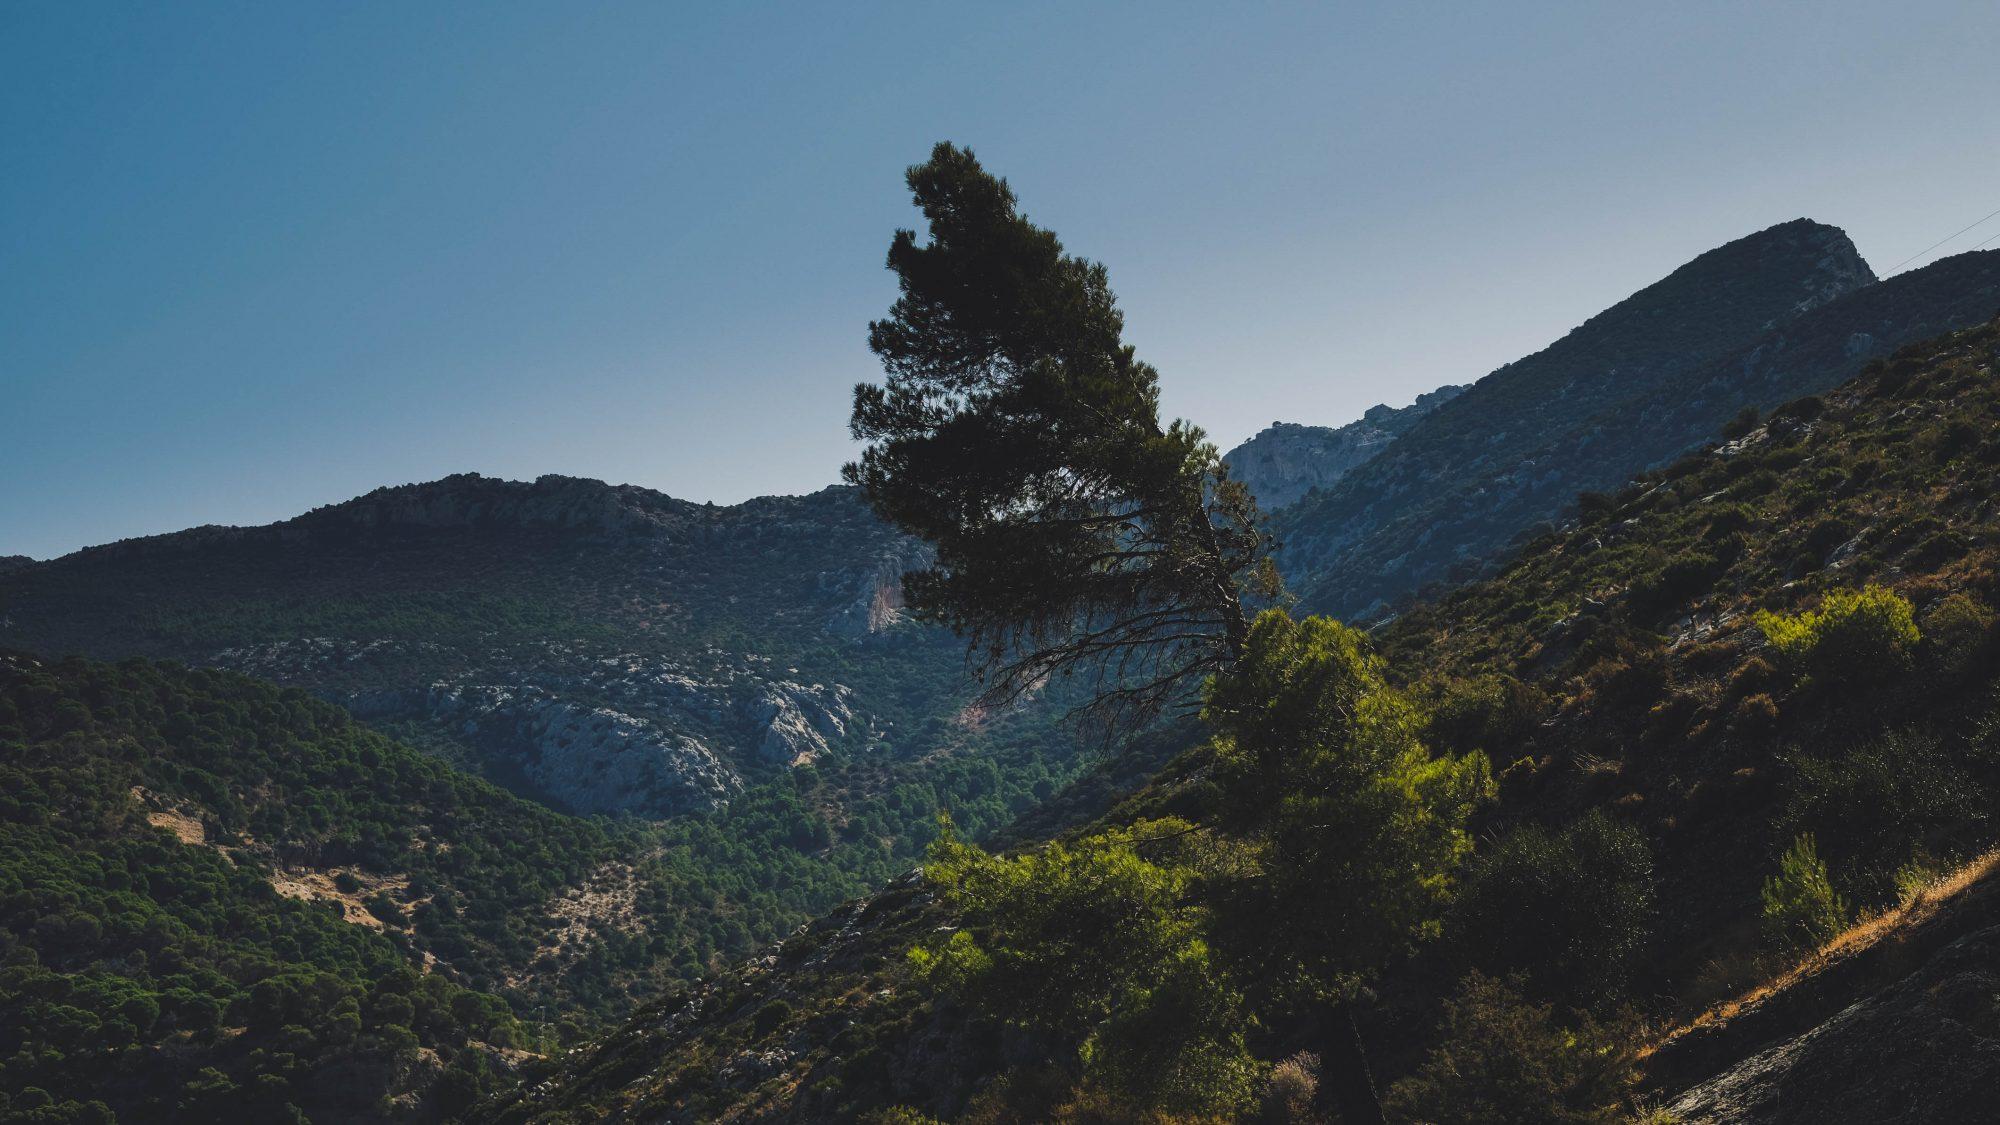 Arbre solitaire - El Chorro, Espagne